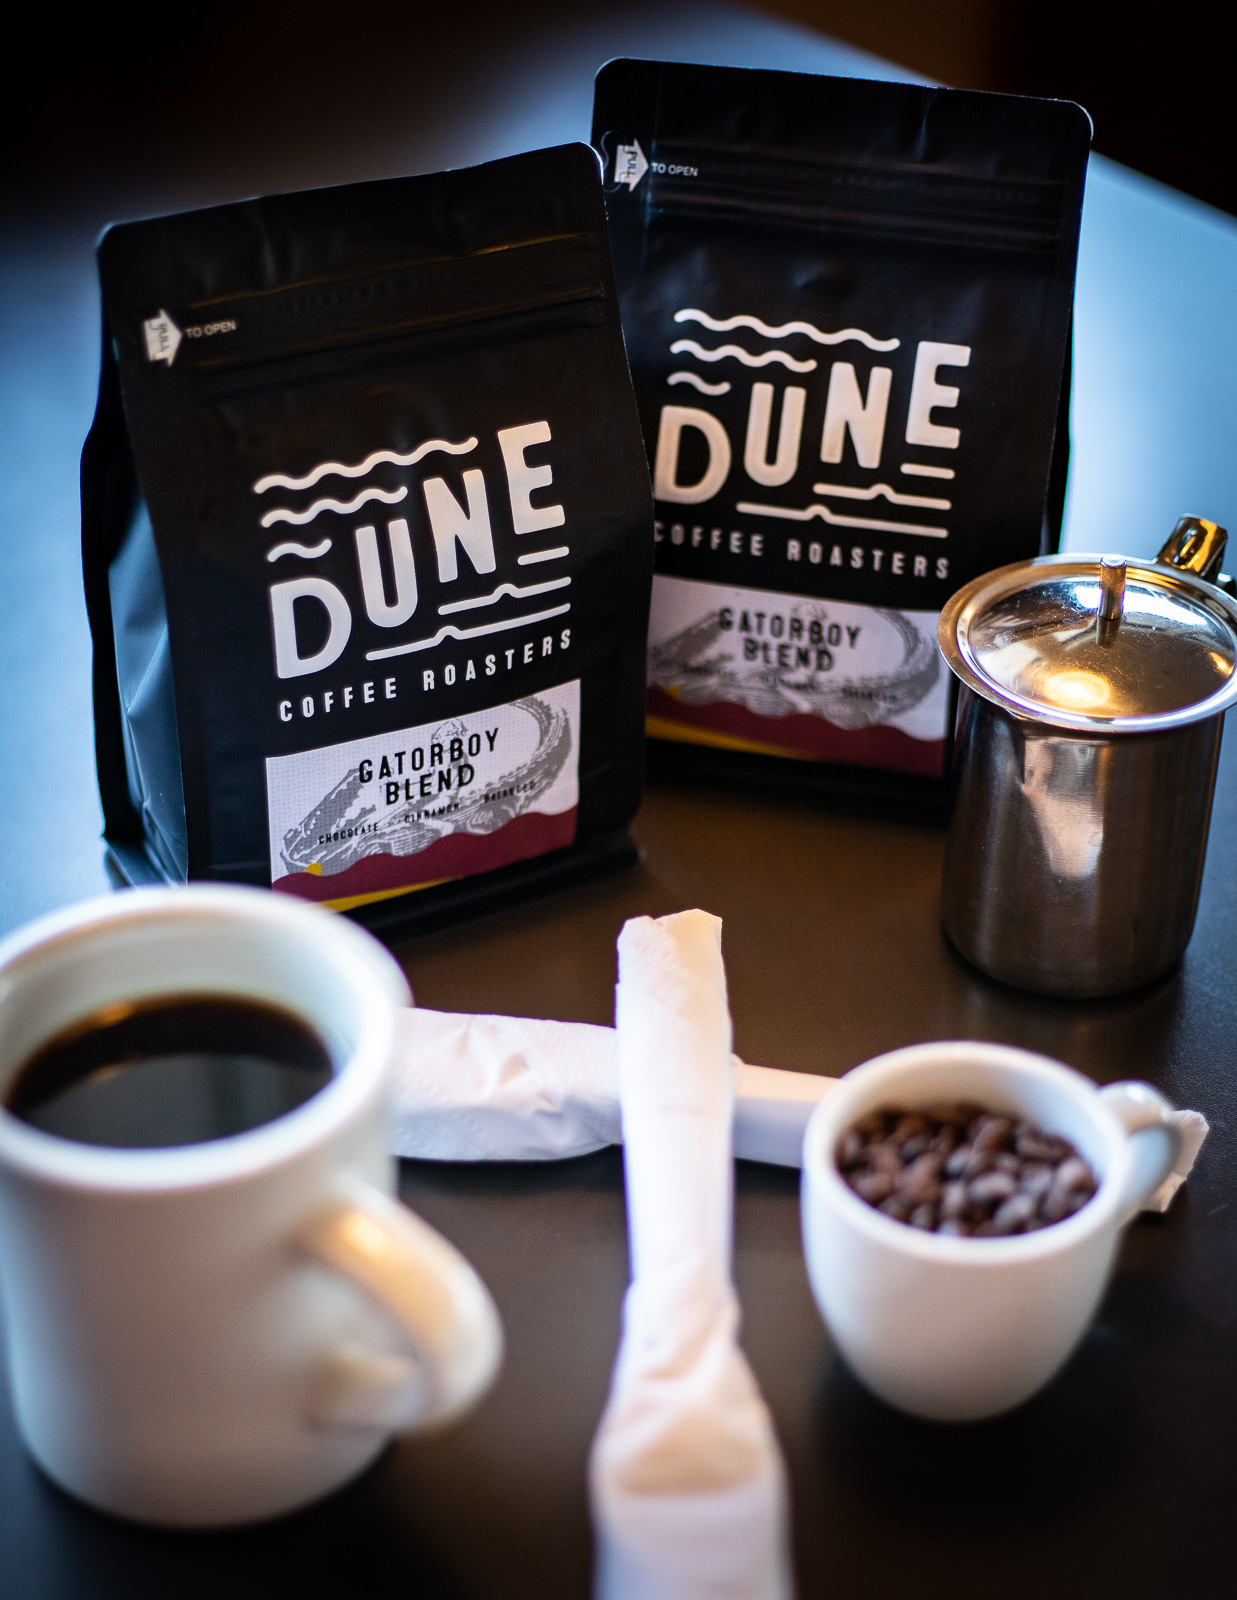 Dune Gator Boy Coffee Sale-5.jpg